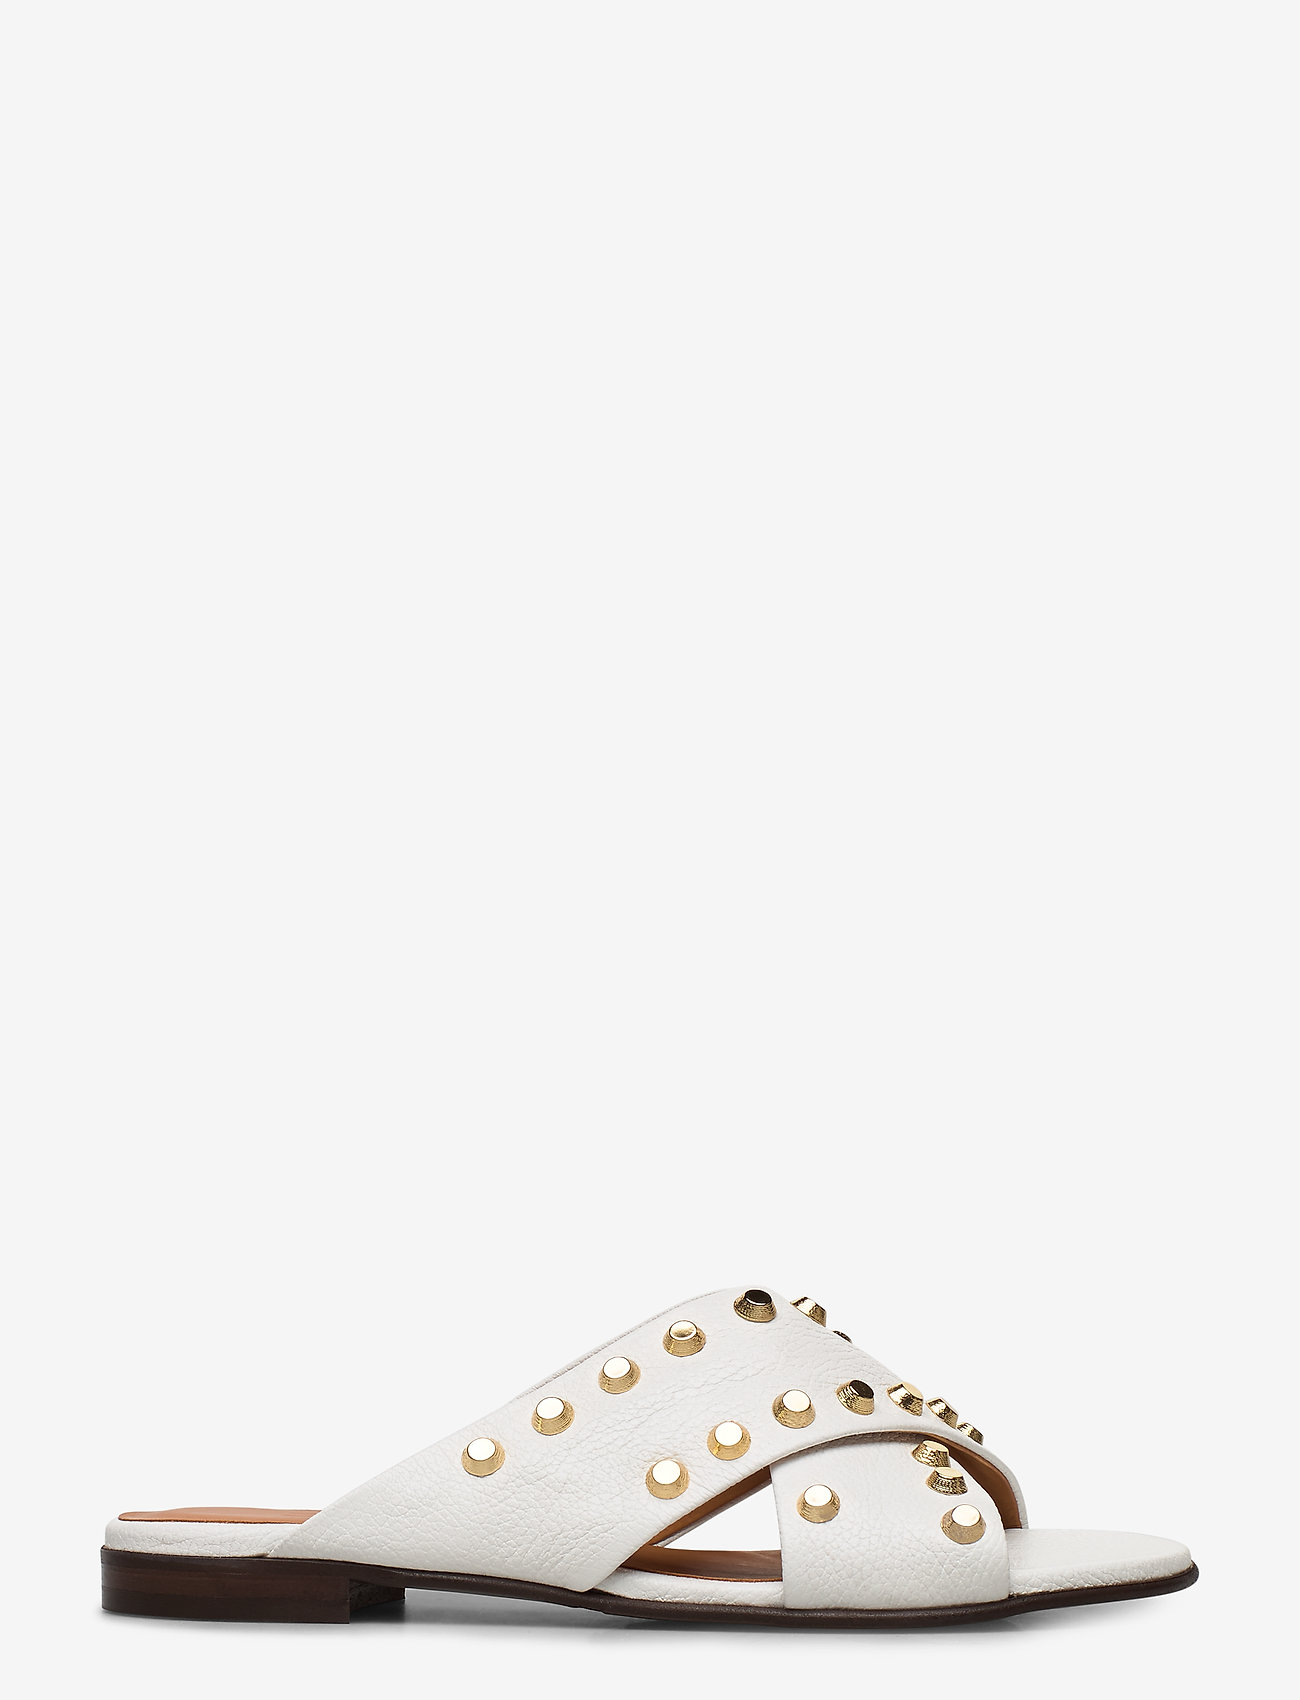 Billi Bi - SANDALS - płaskie sandały - white buffalo/gold 832 - 1